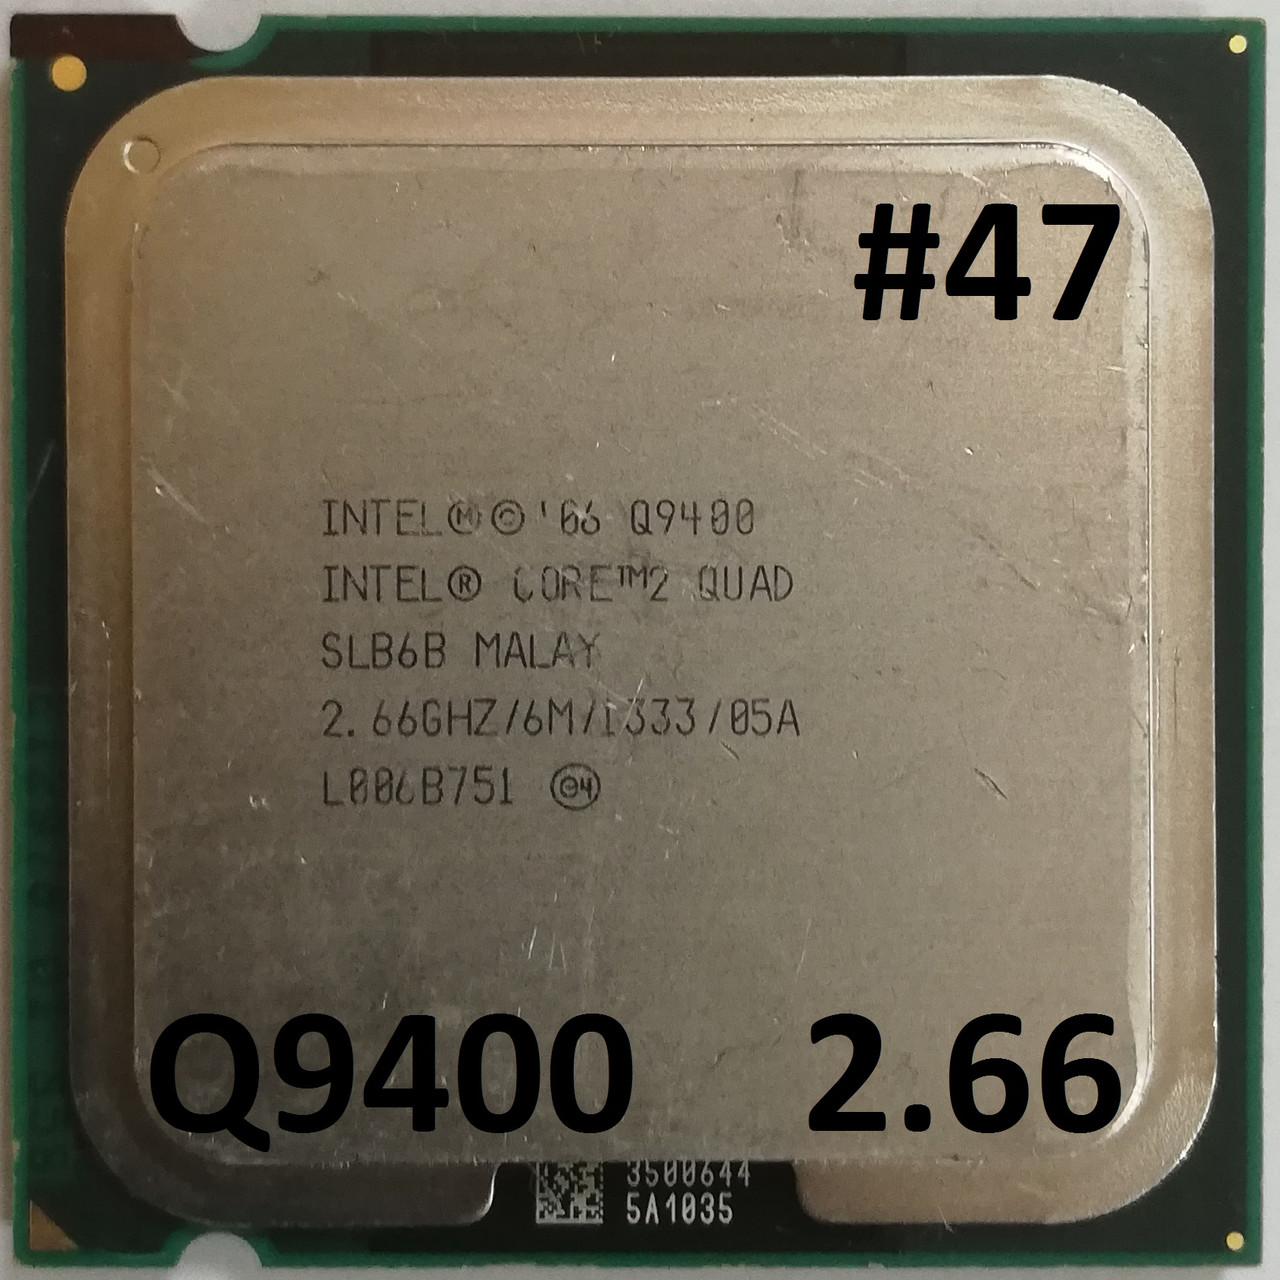 Процессор  ЛОТ #47 Intel® Core™2 Quad Q9400 R0 SLB6B 2.66GHz 6M Cache 1333 MHz FSB Soket 775 Б/У